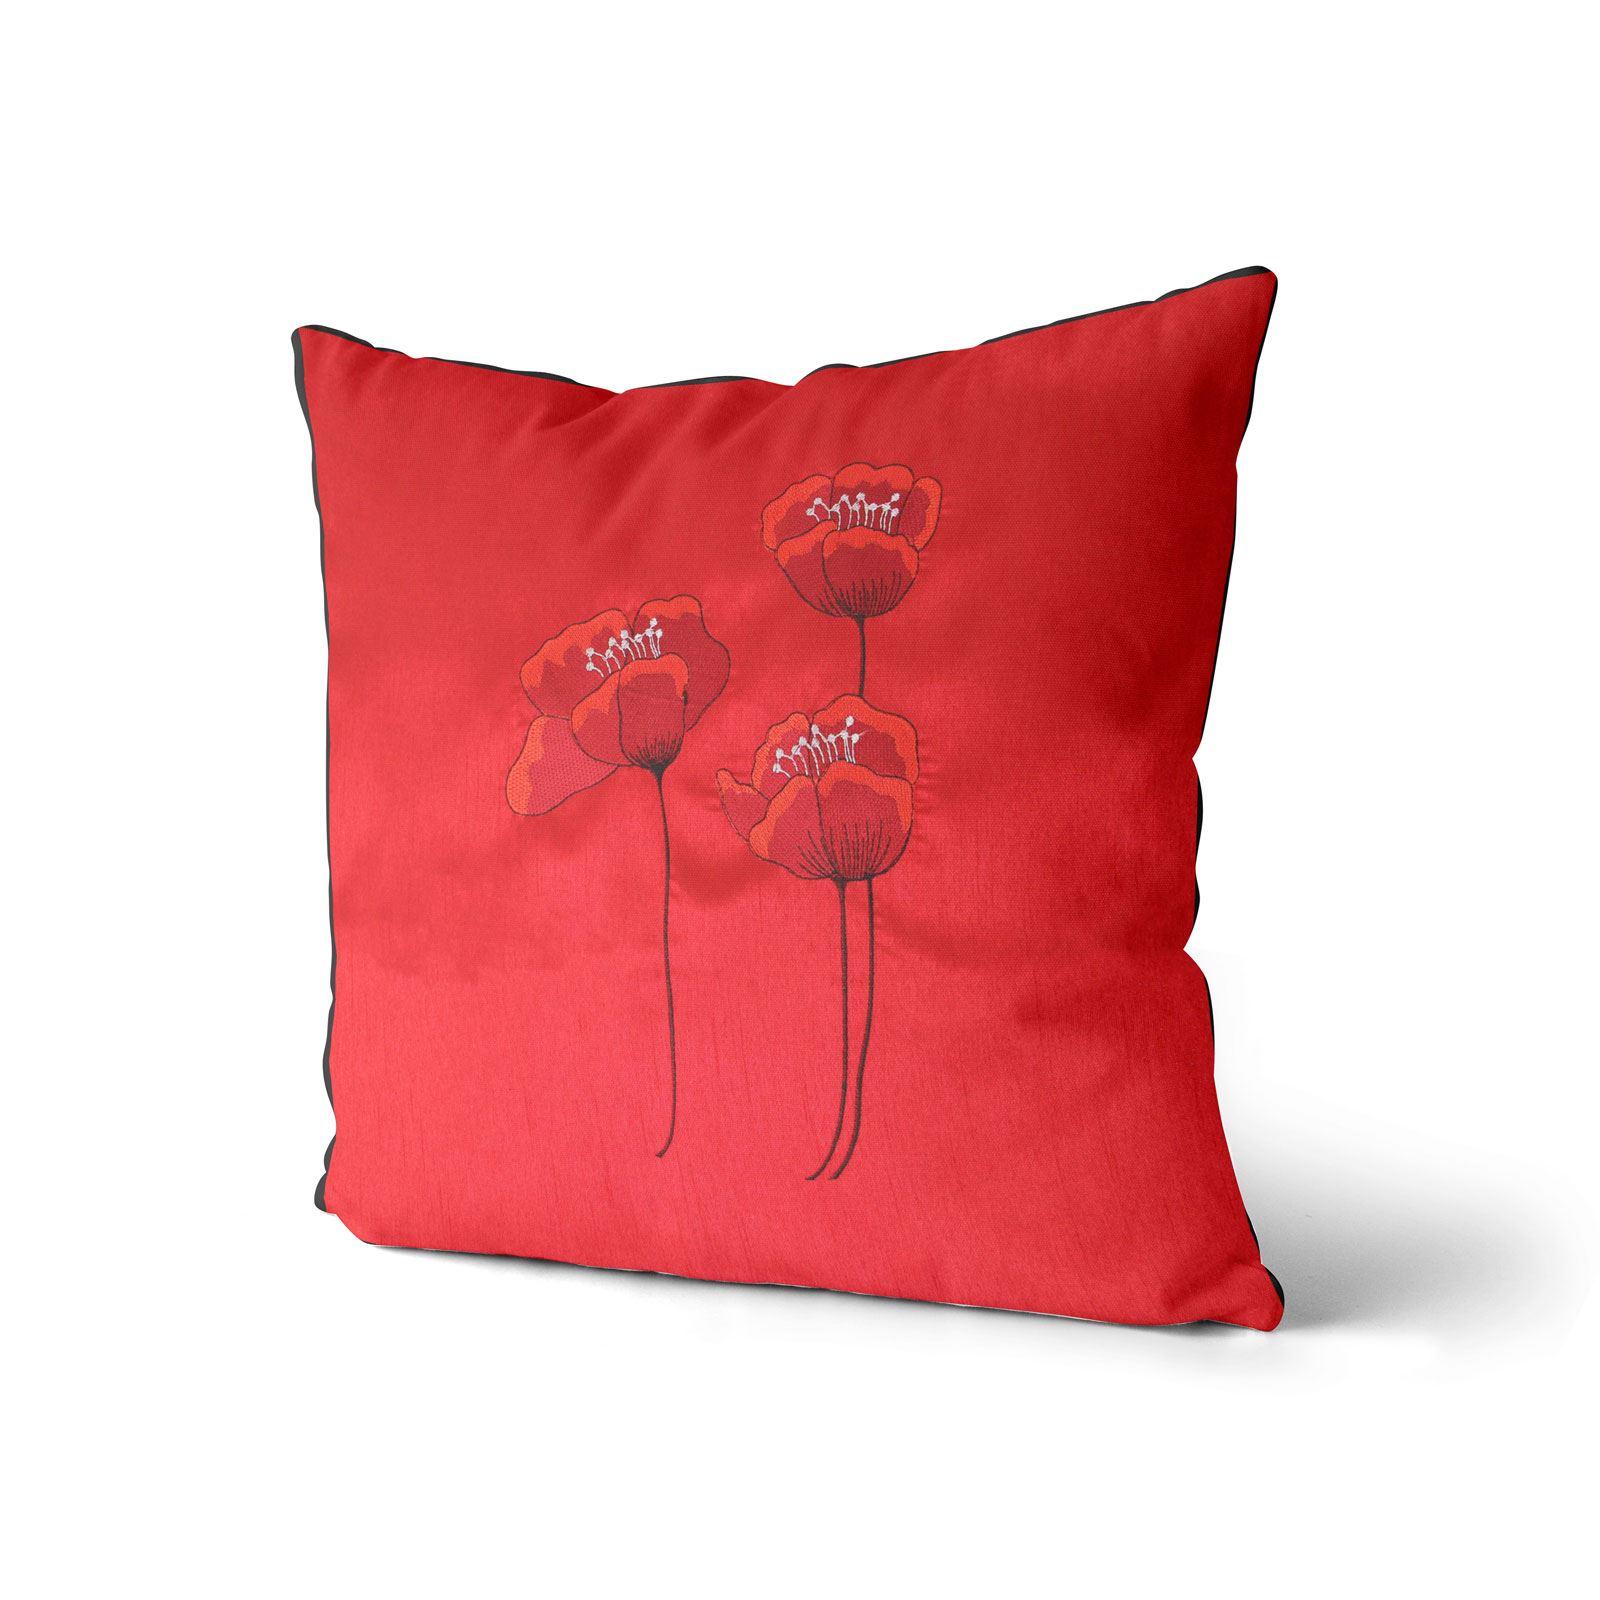 Vino-Tinto-Cushion-Covers-Coleccion-17-034-18-034-43cm-45cm-Cubierta miniatura 34